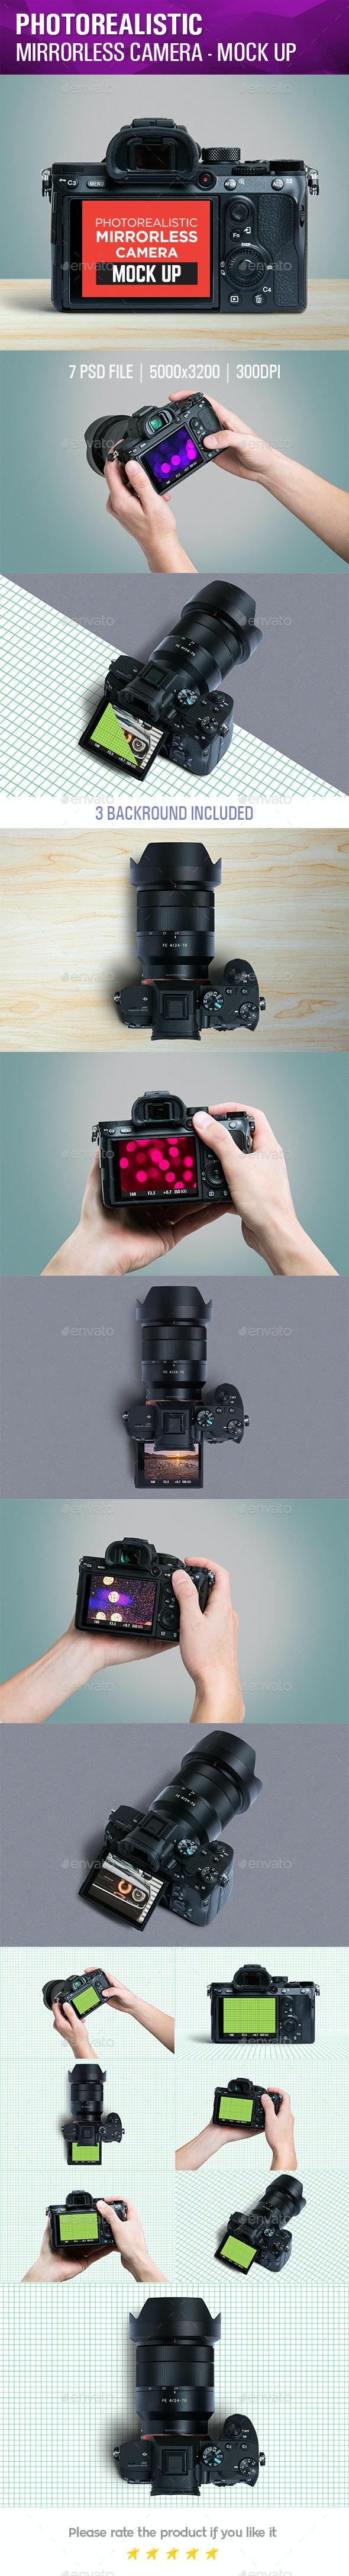 Photorealistic Mirrorless Camera Mock Up - Product Mock-Ups Graphics